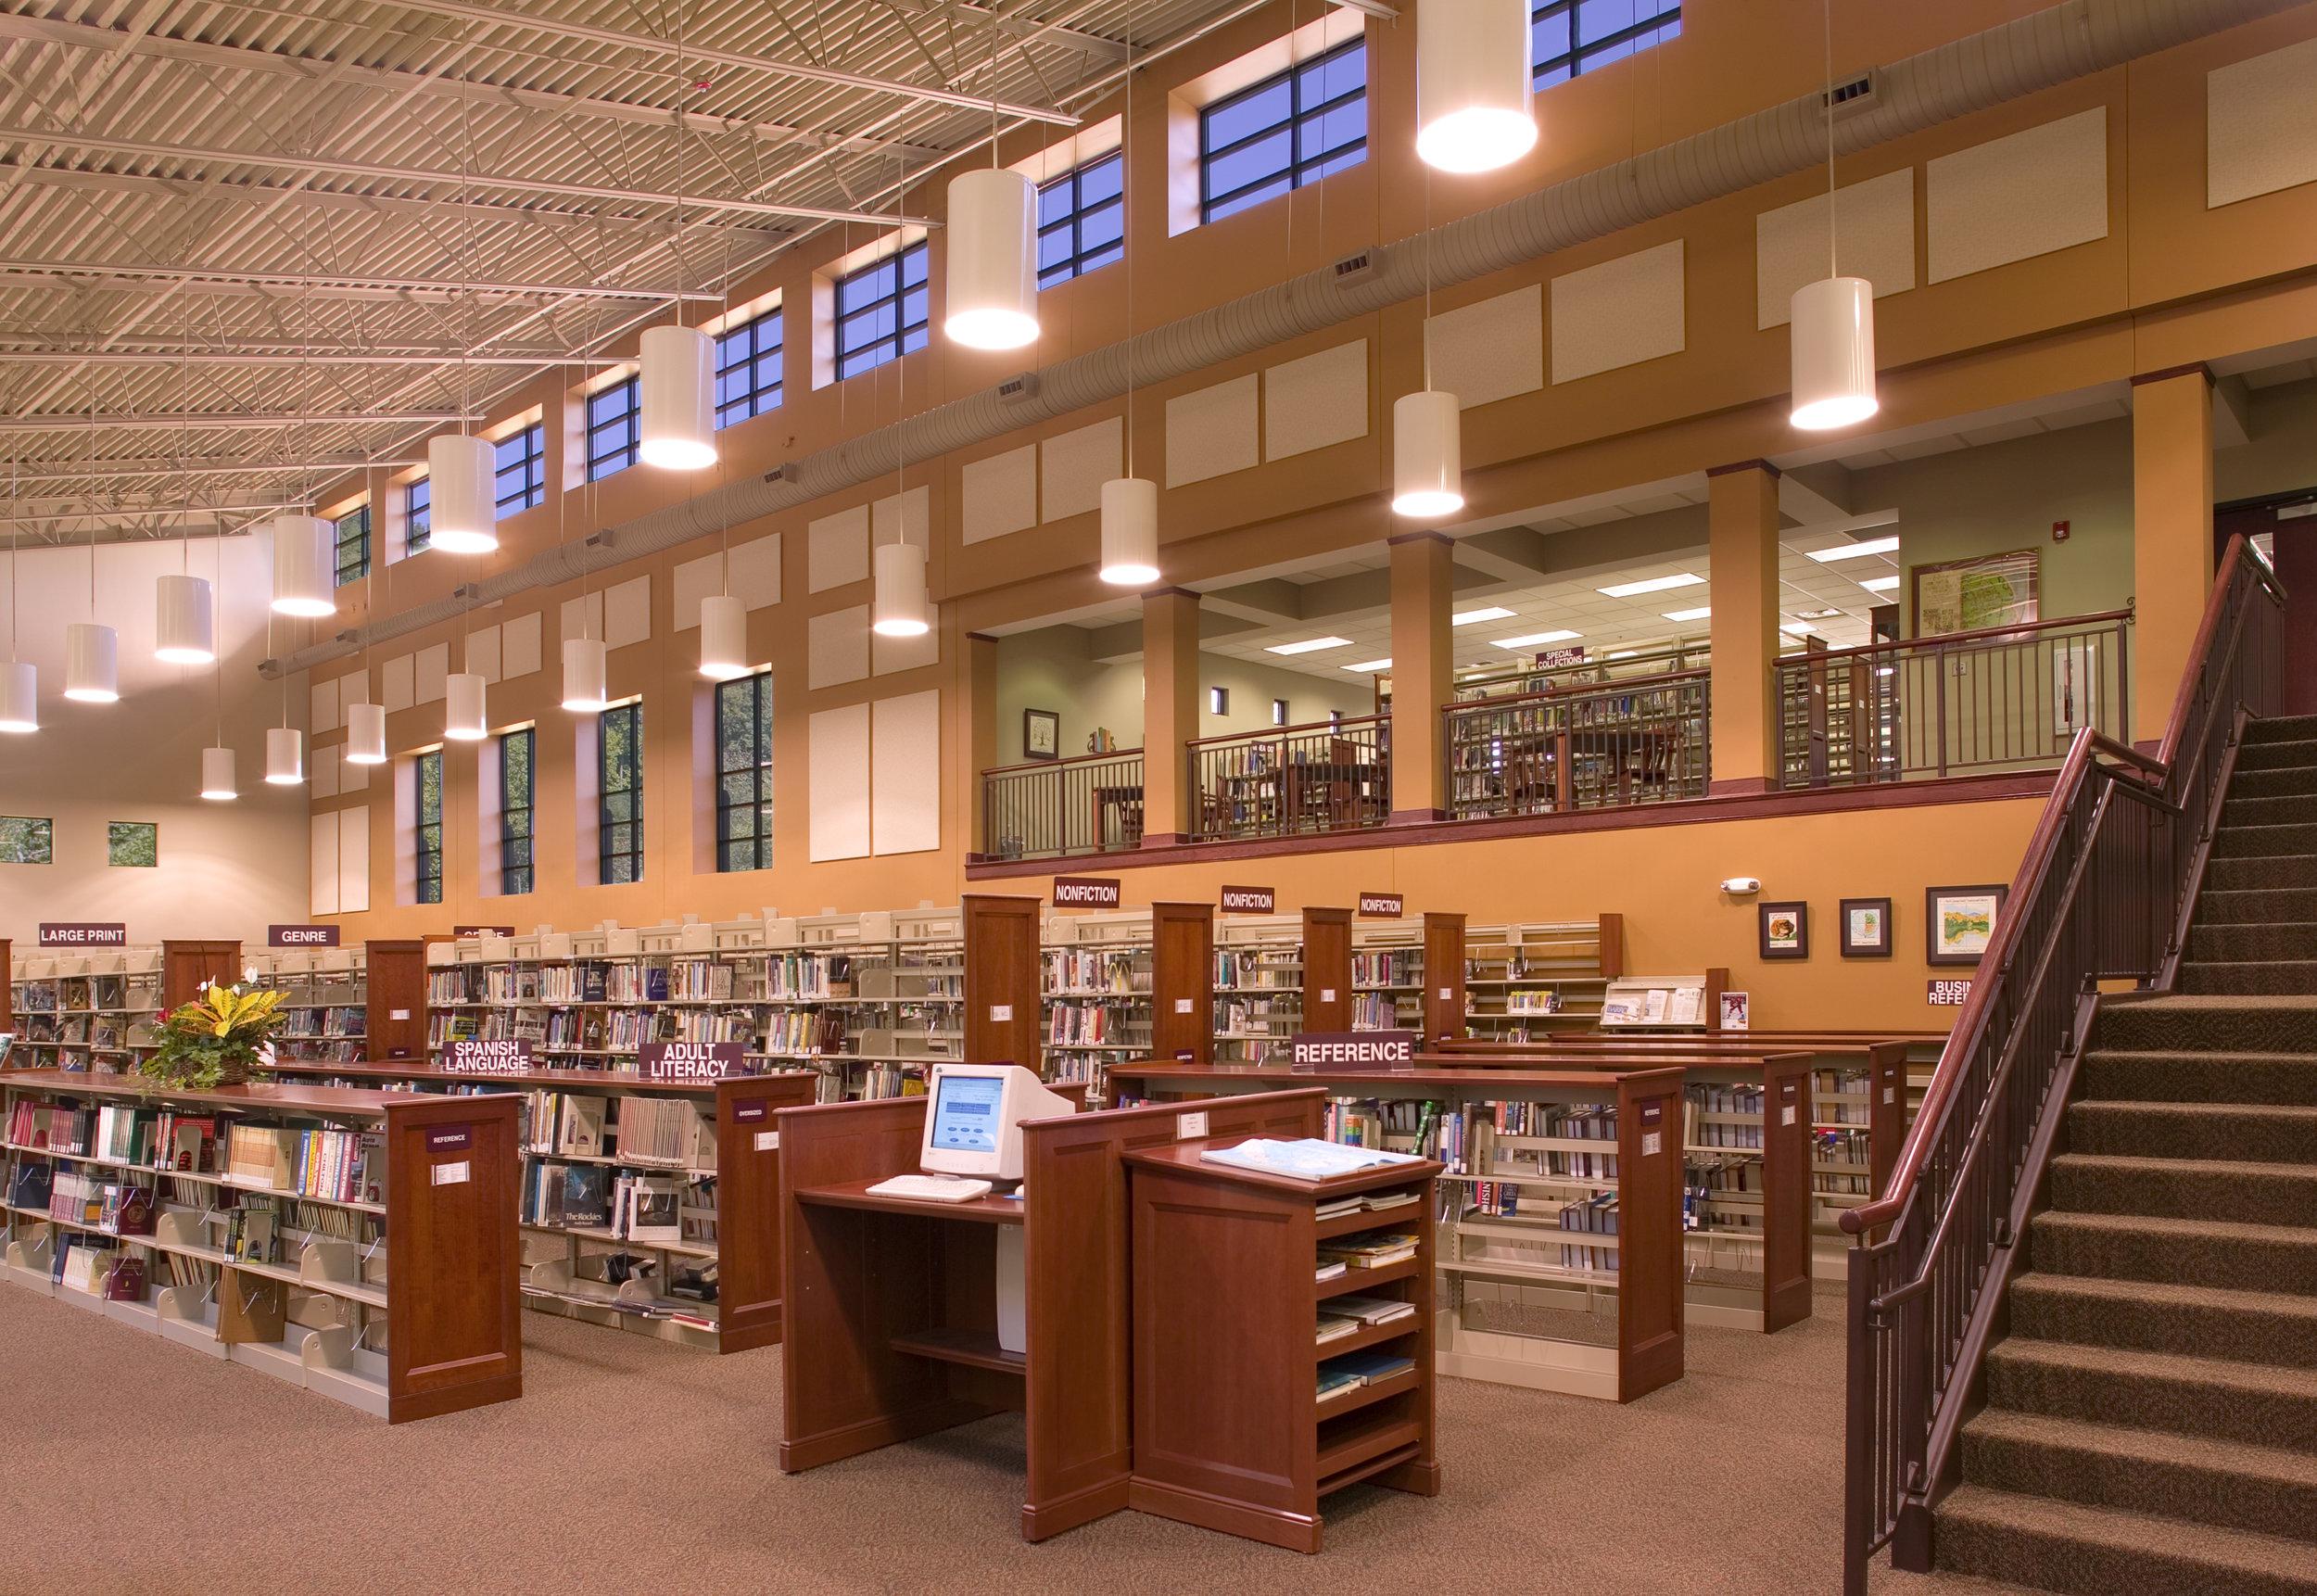 ADW-Civic-Library-Polk-County-Columbus-NC-Interior-2.jpg